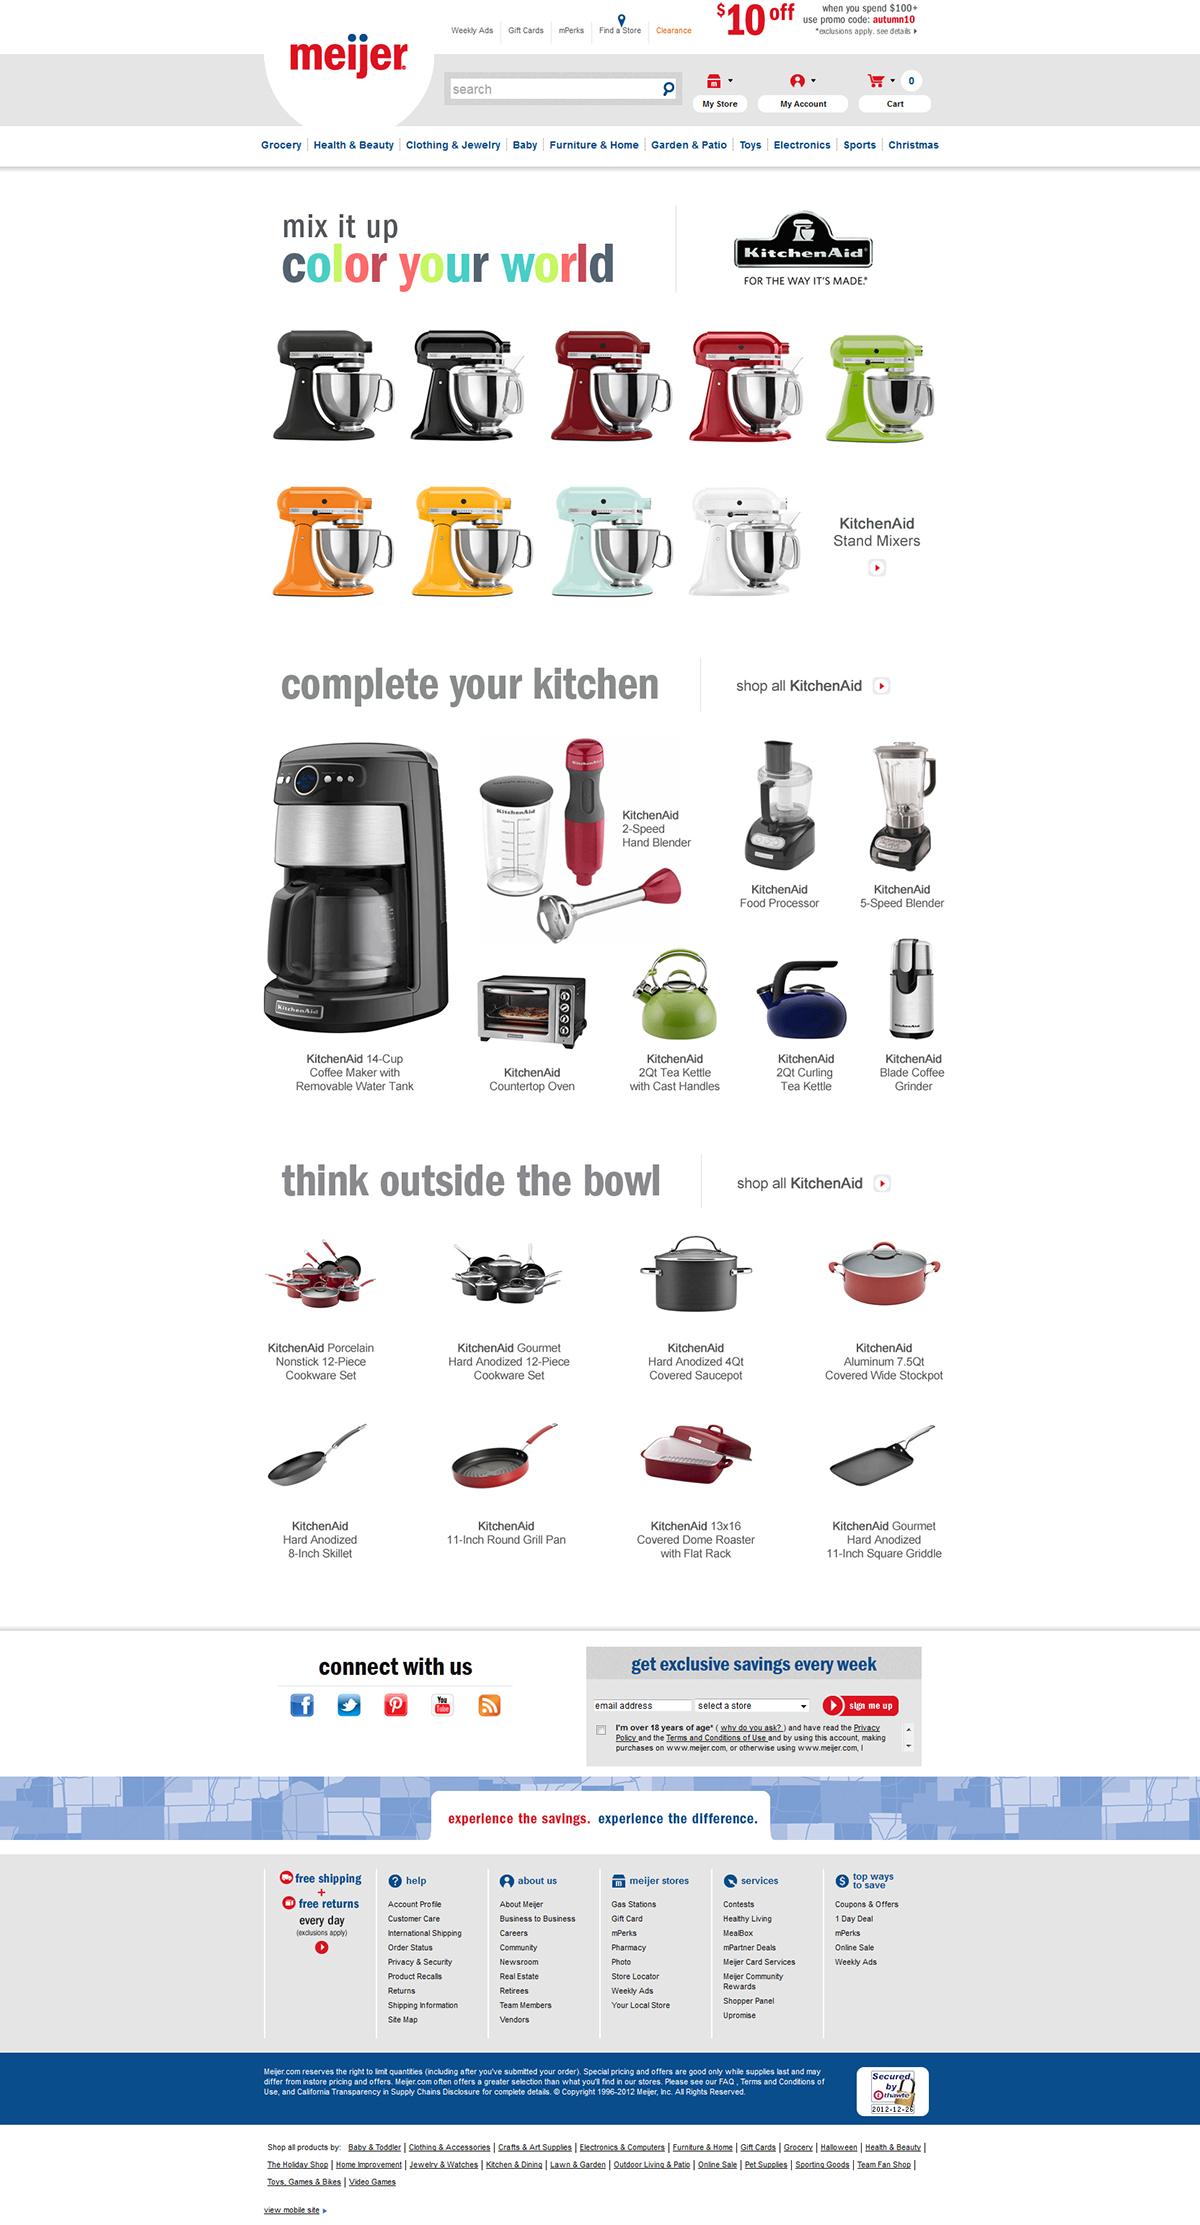 Meijer - KitchenAid on Behance